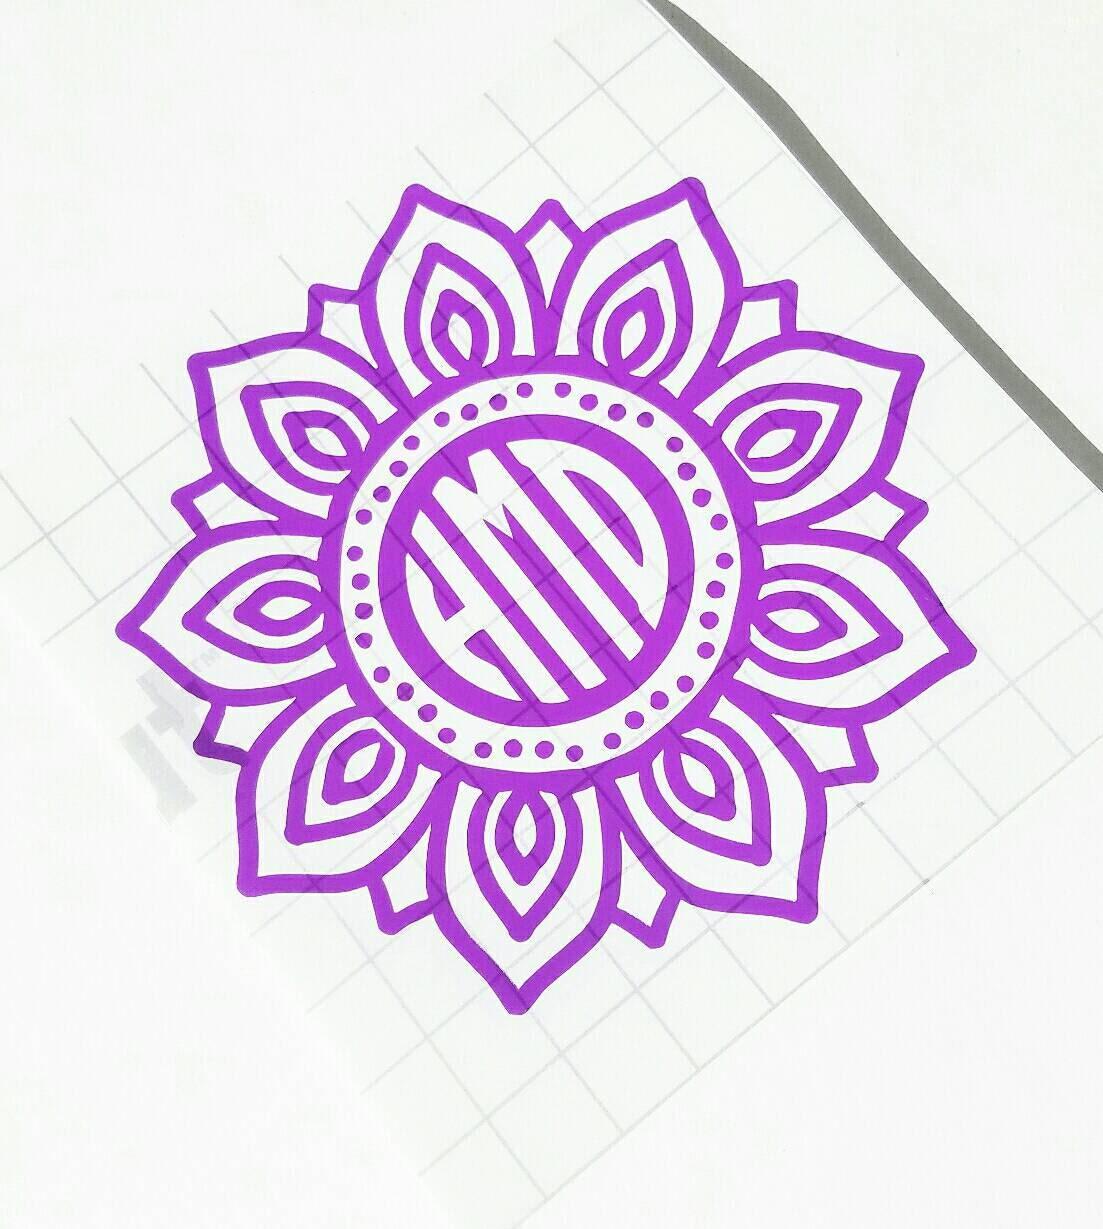 Shop Floral Monograms At Littlebrownnest Etsy Com: Flower Monogram // Mandala Monogram // Vinyl Decal // Laptop